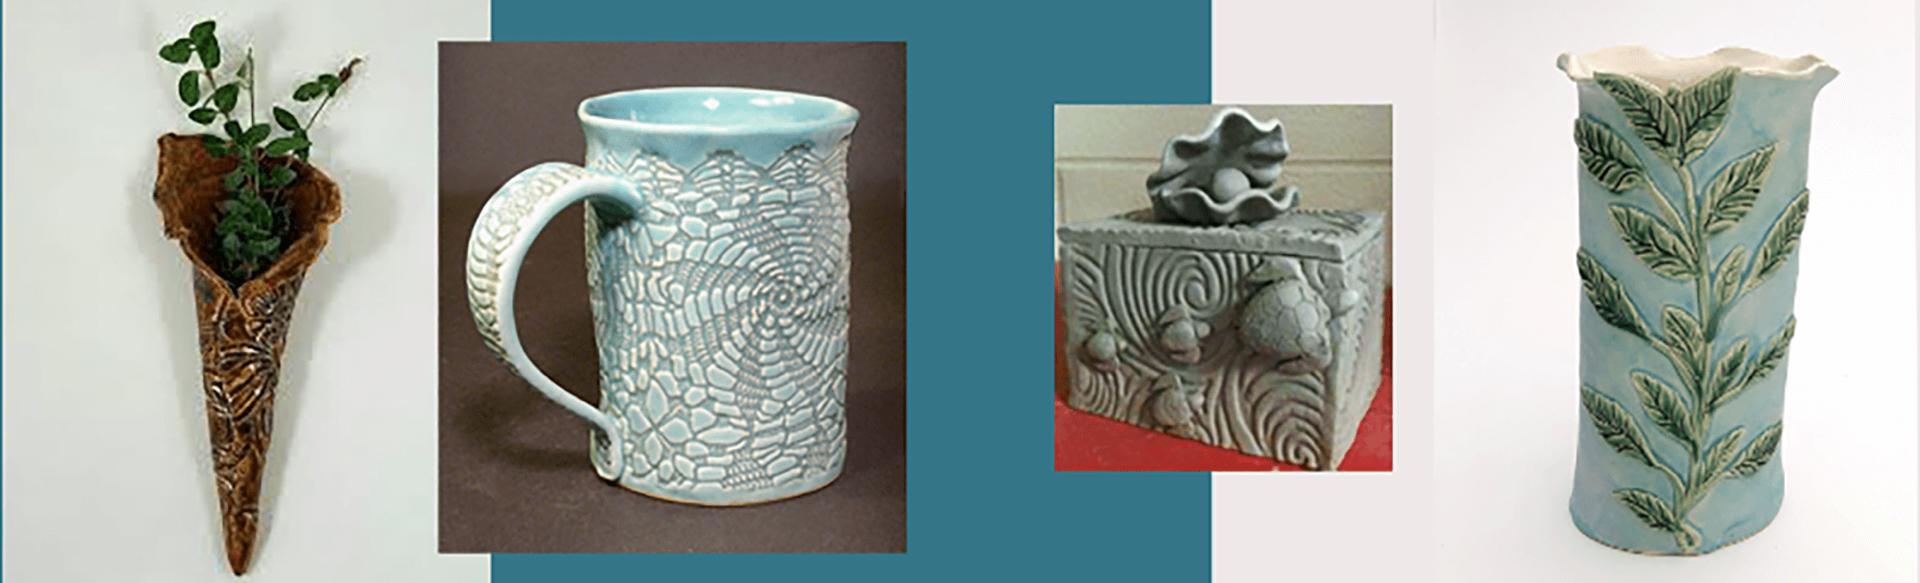 wall sconce, mug, covered jar, vase